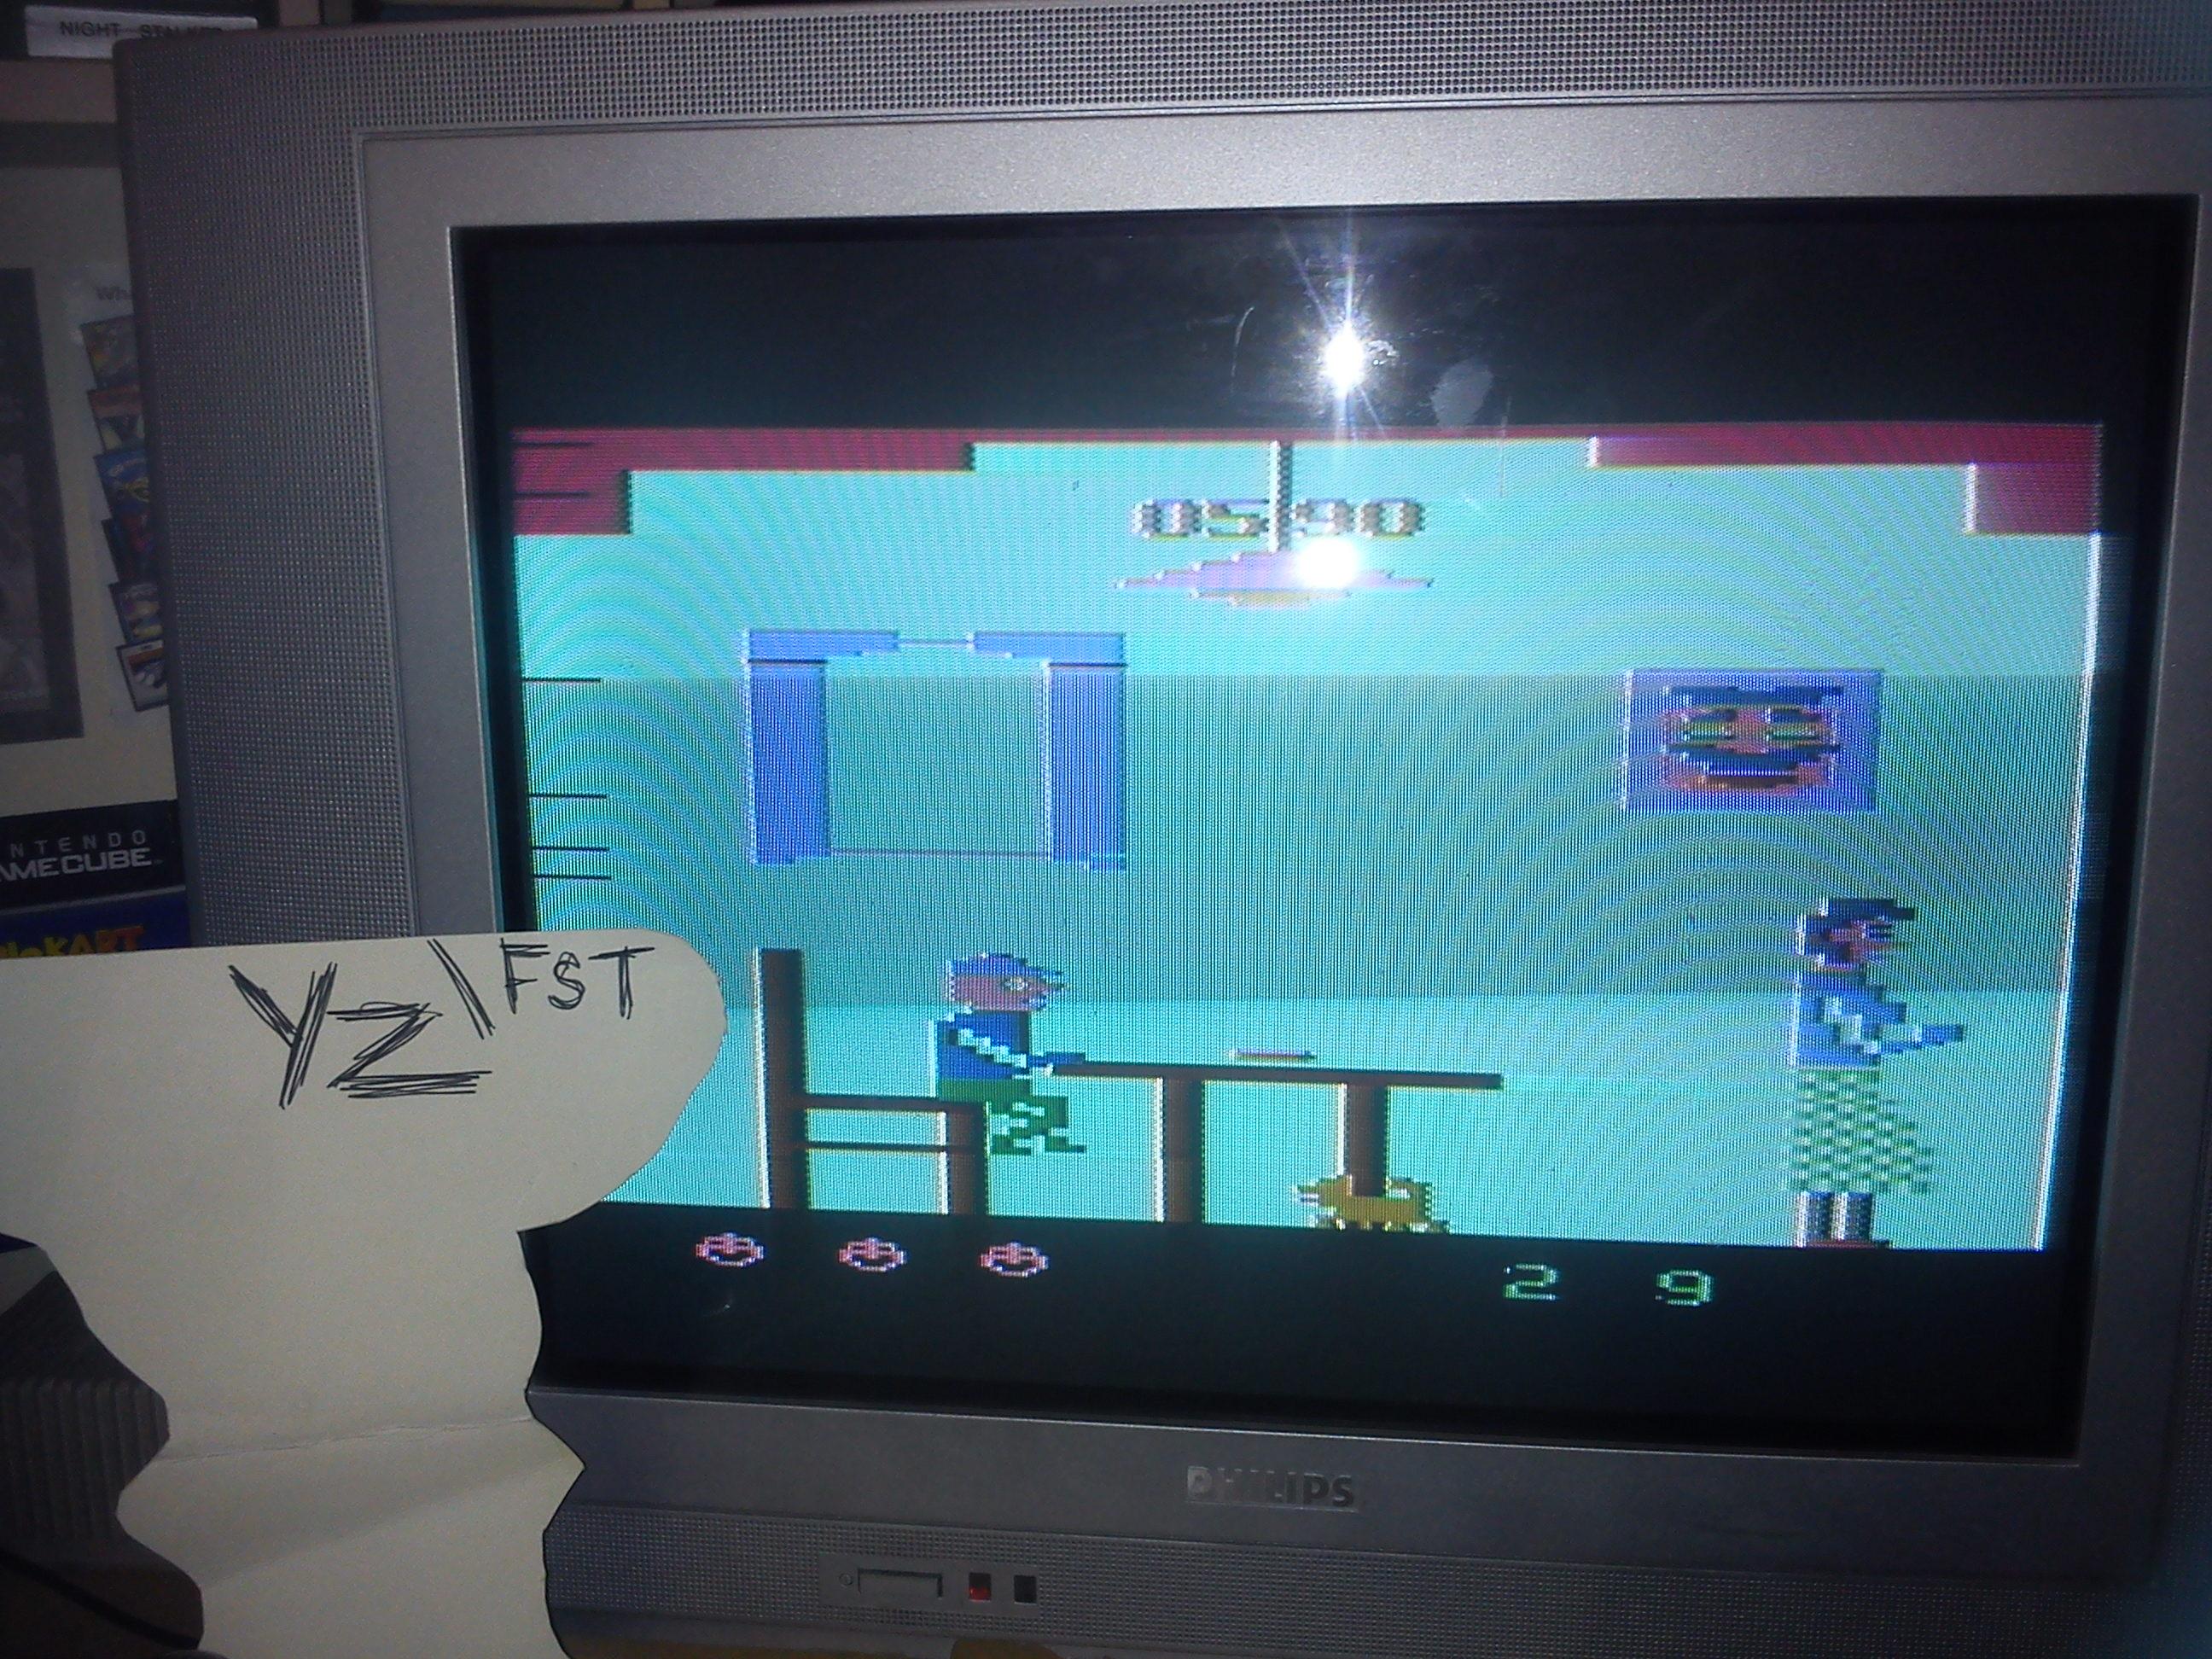 Fr0st: Mangia (Atari 2600) 590 points on 2014-06-03 15:58:04